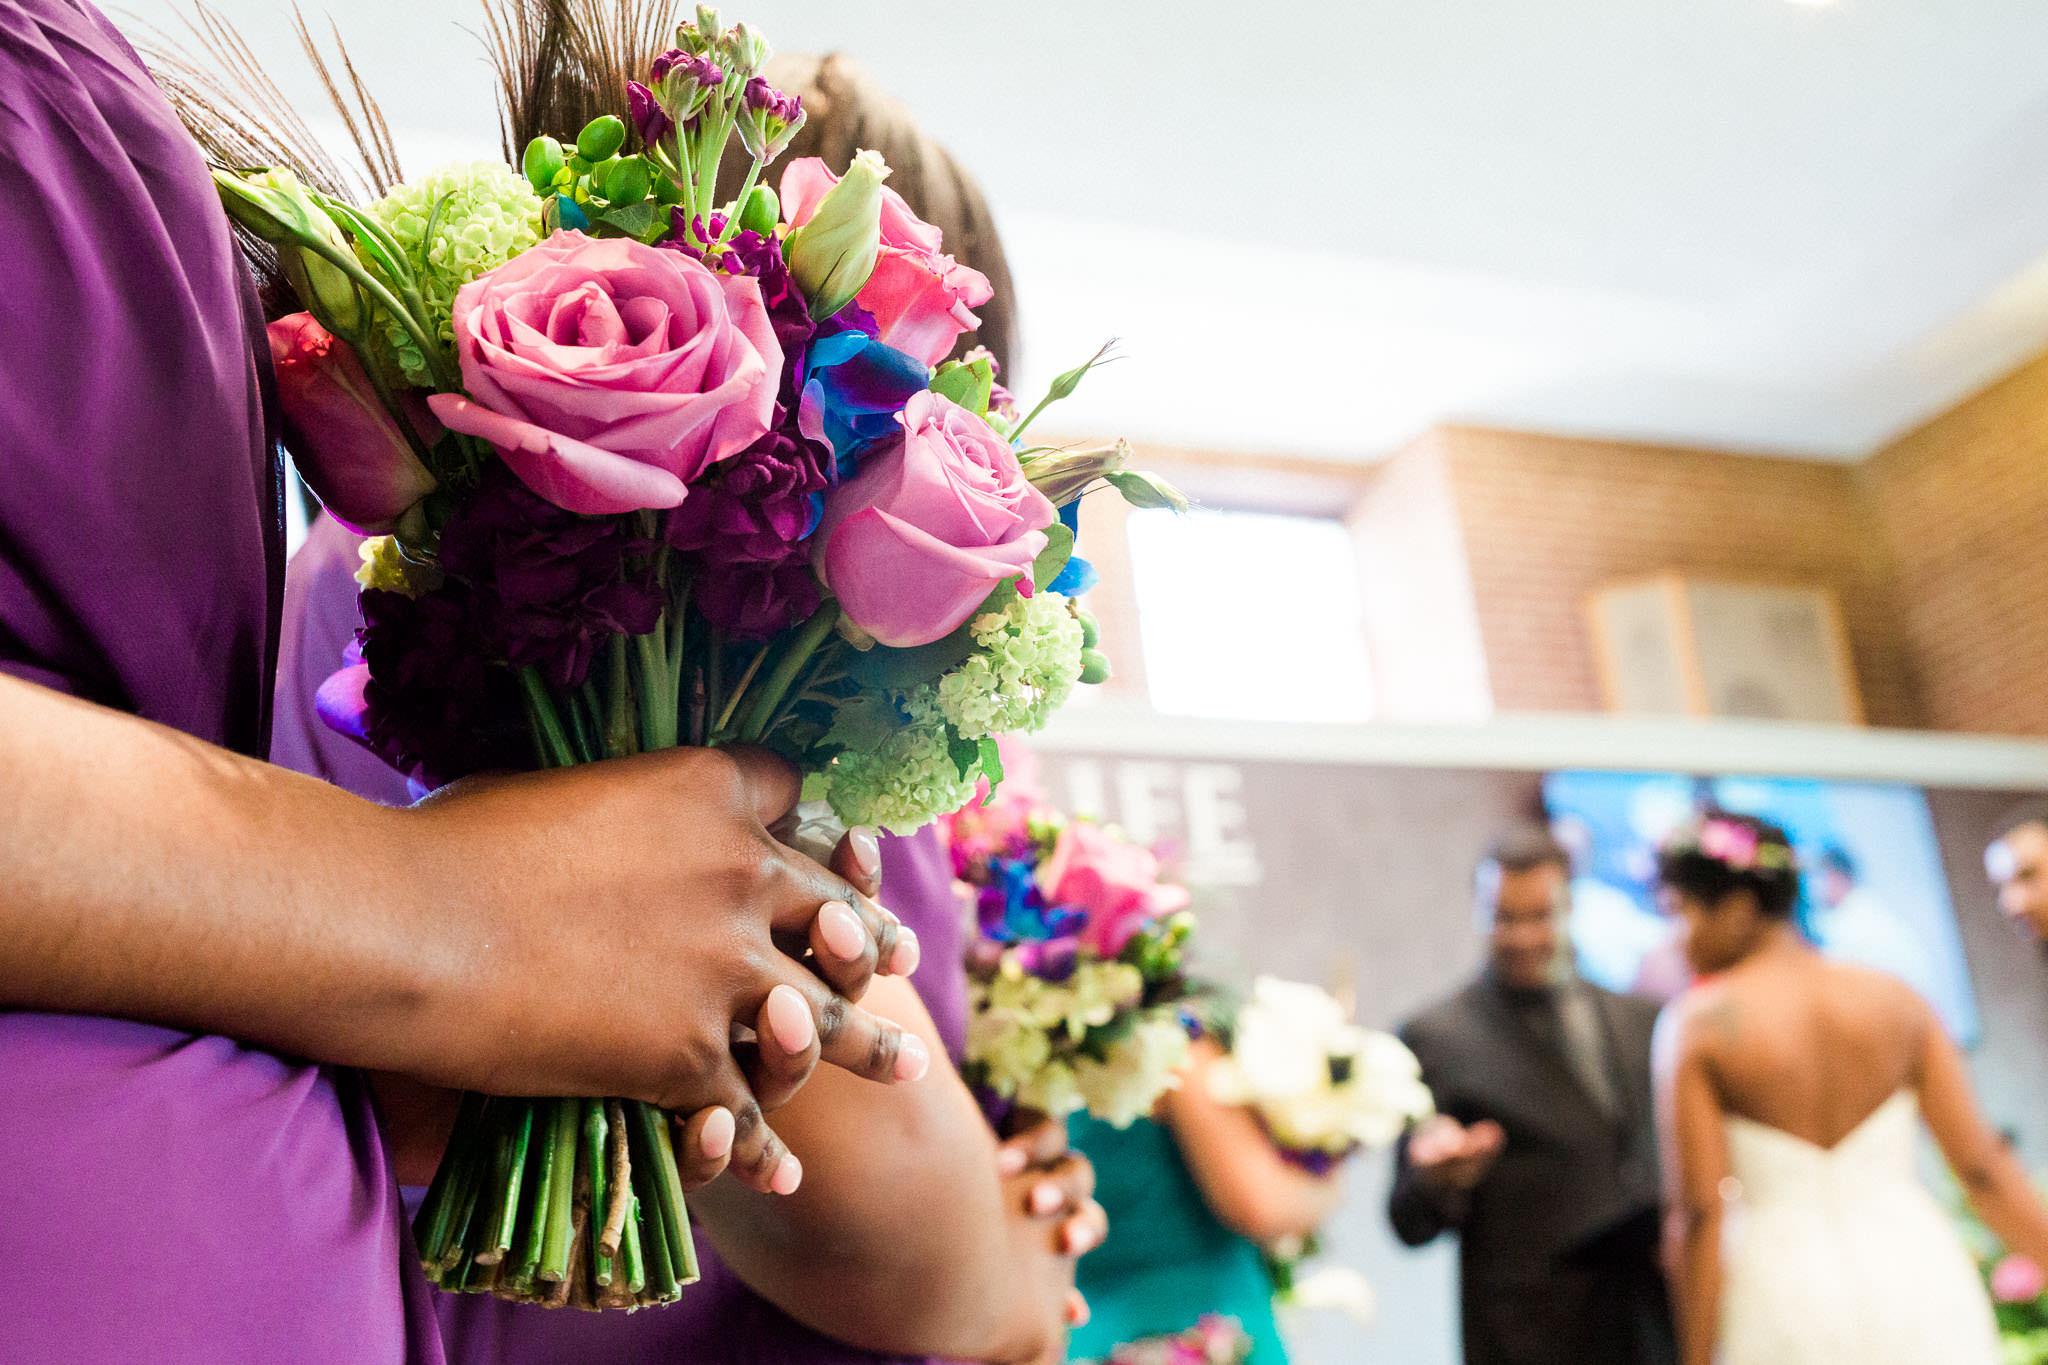 st-louis-photographer-machinist-hall-wedding-10.jpg